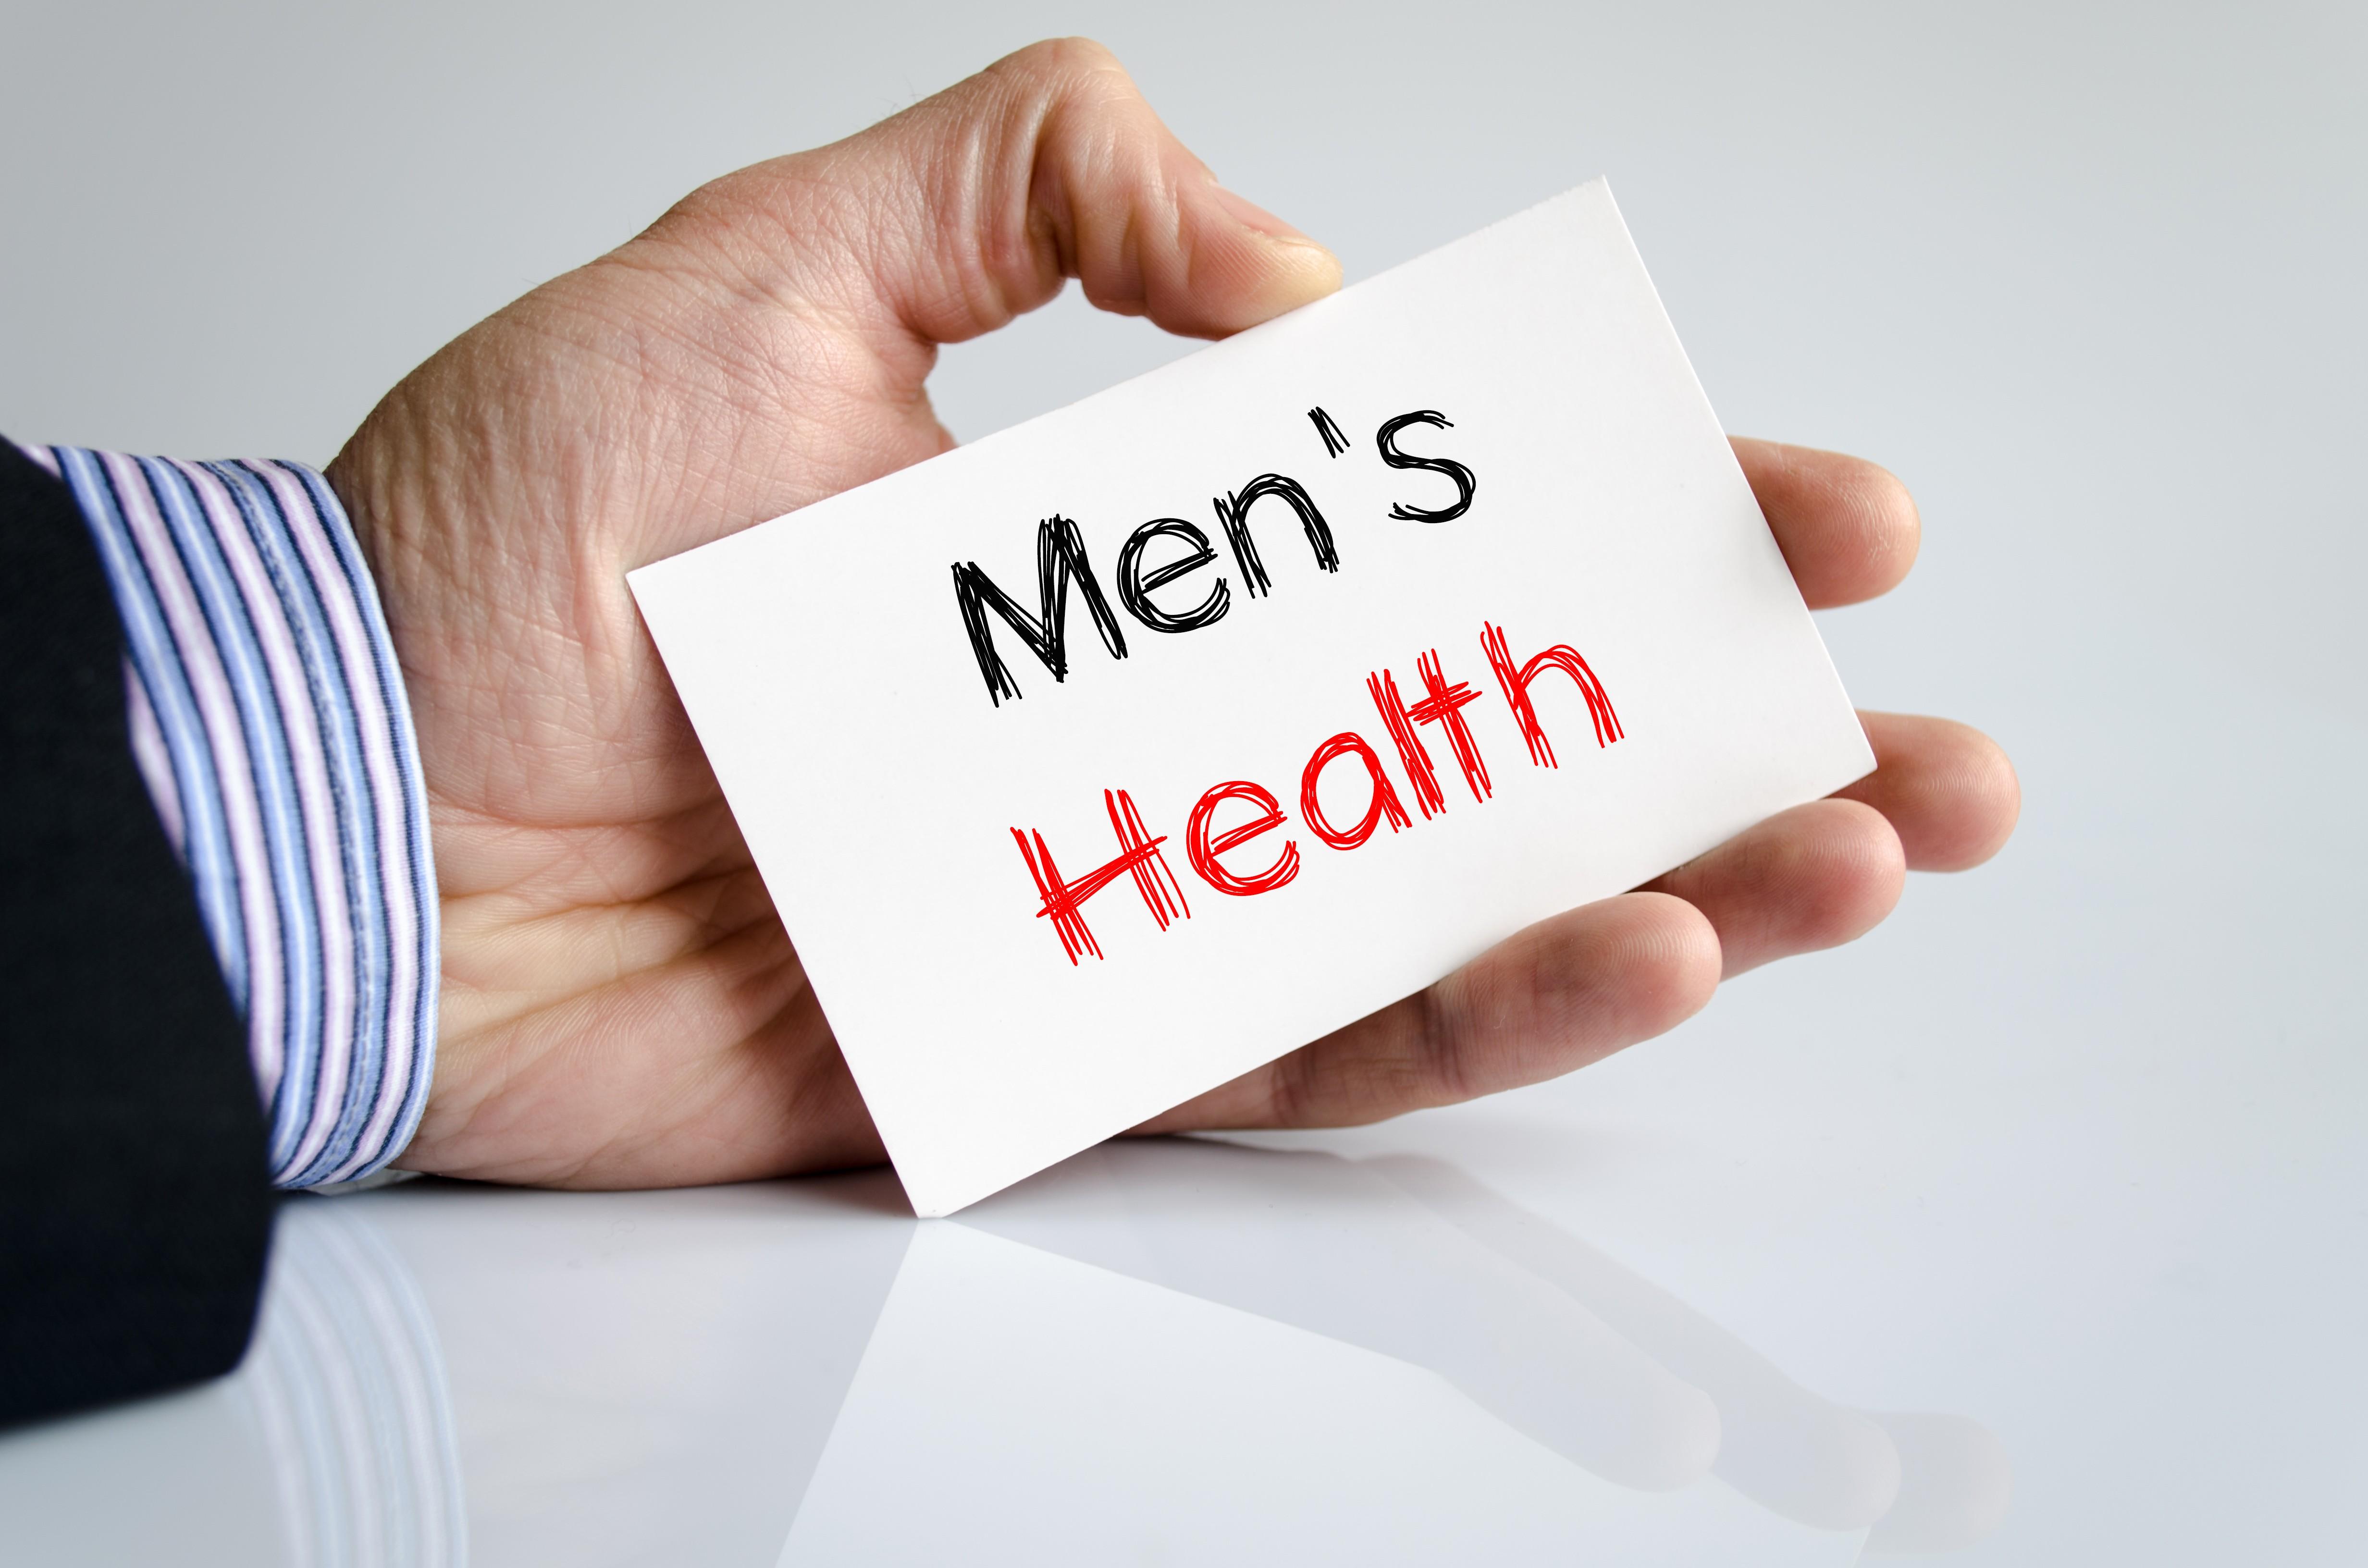 Health screenings as an indicator of men's health